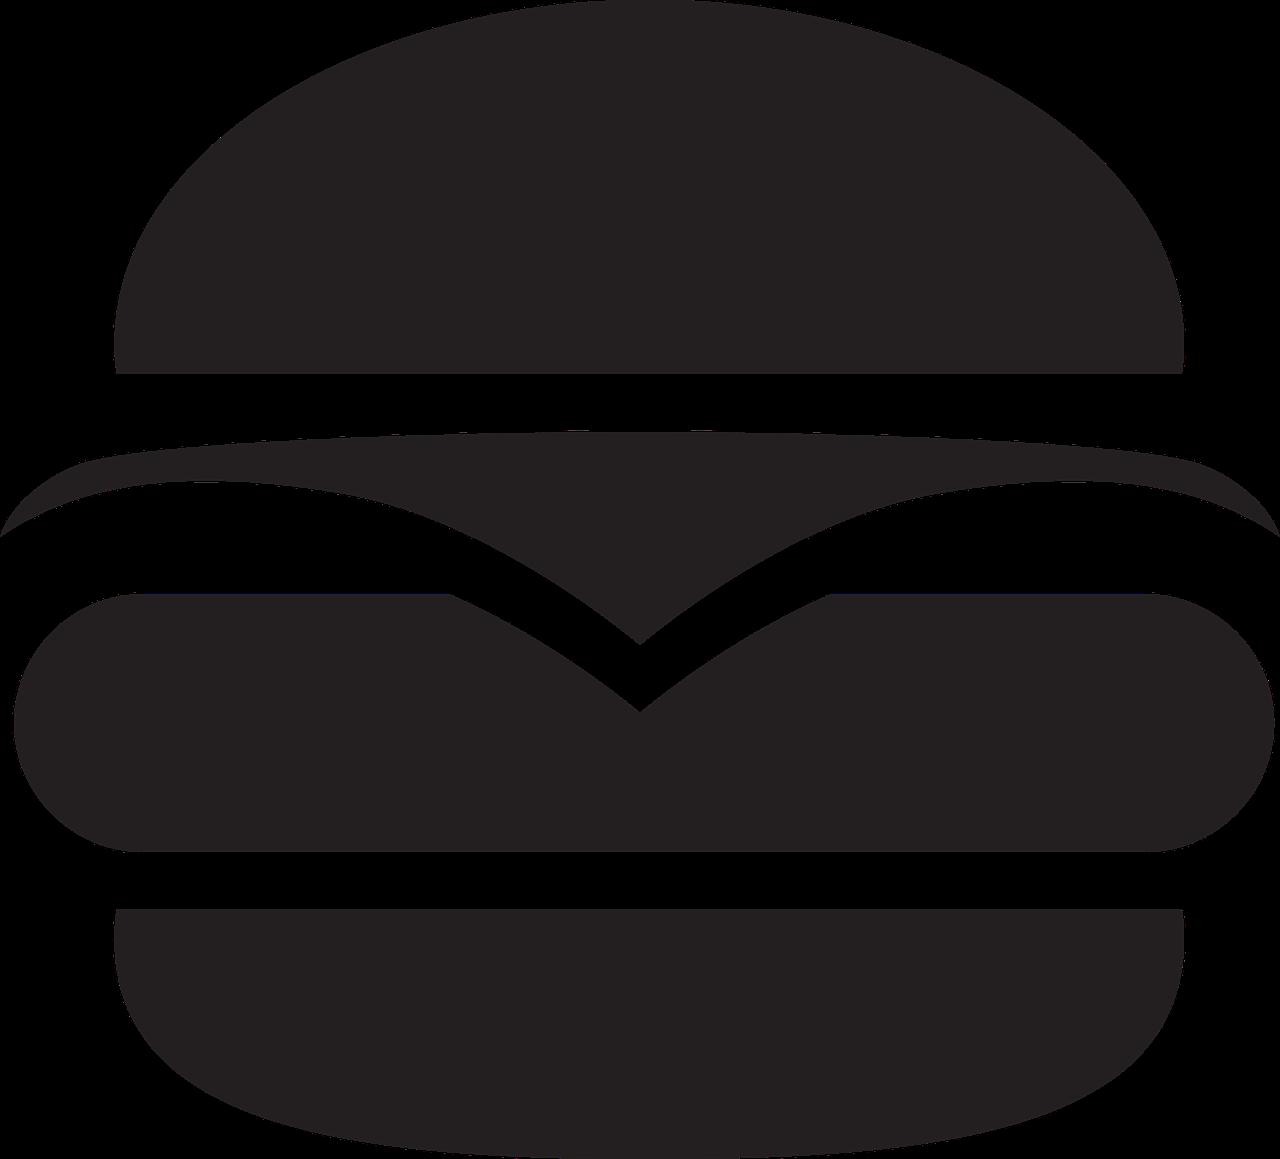 Food Hamburguer Desenho Png Clipart Full Size Clipart 598227